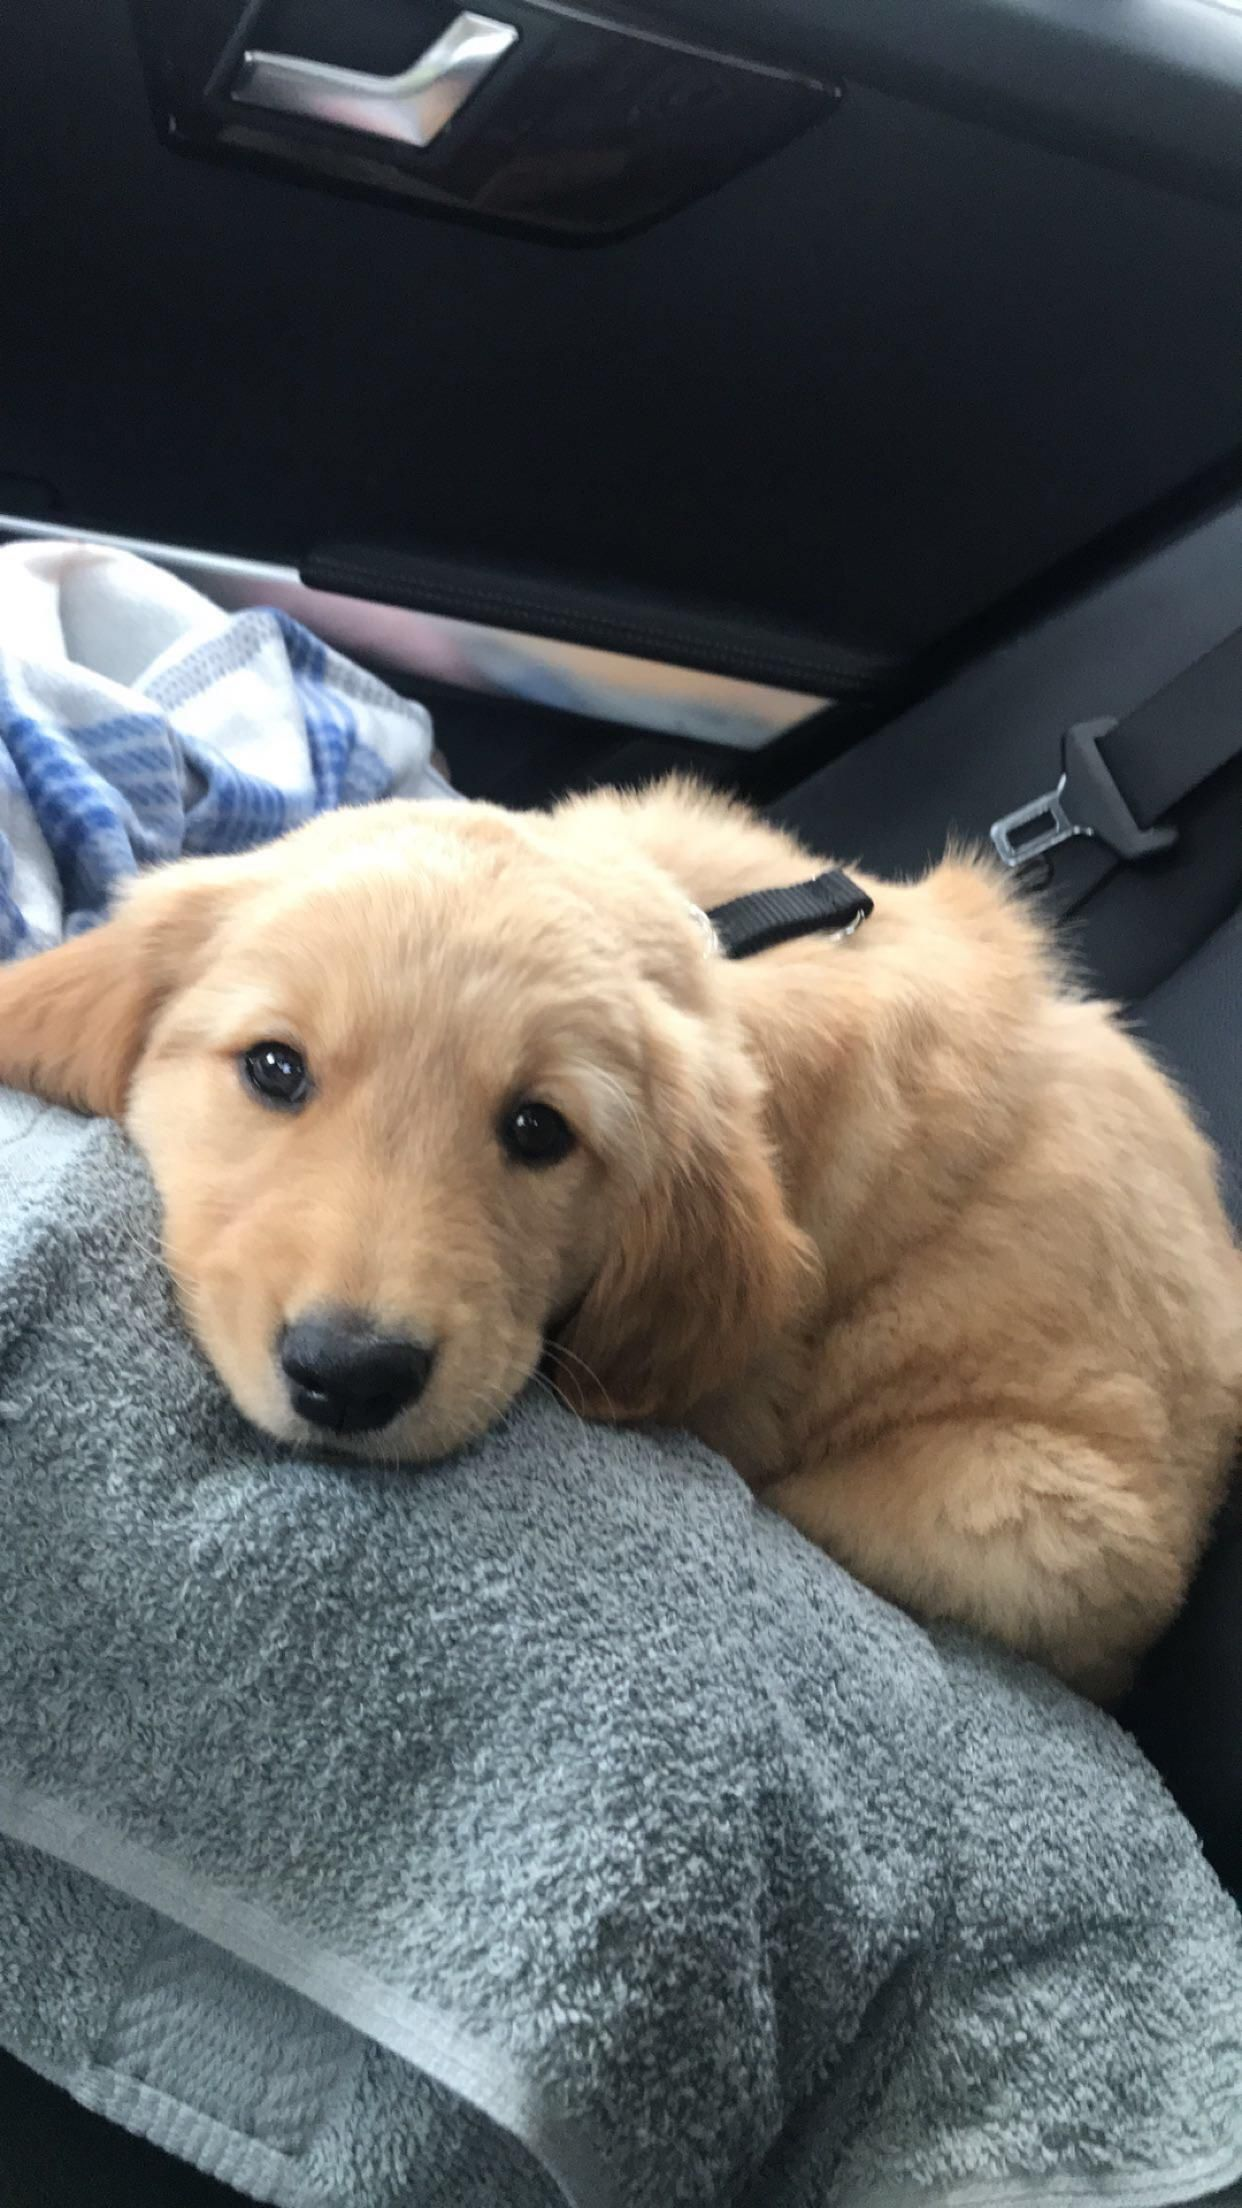 47 Adorable Golden Retriever Mix Breeds Golden Retriever Dogs Golden Retriever Dogs And Puppies